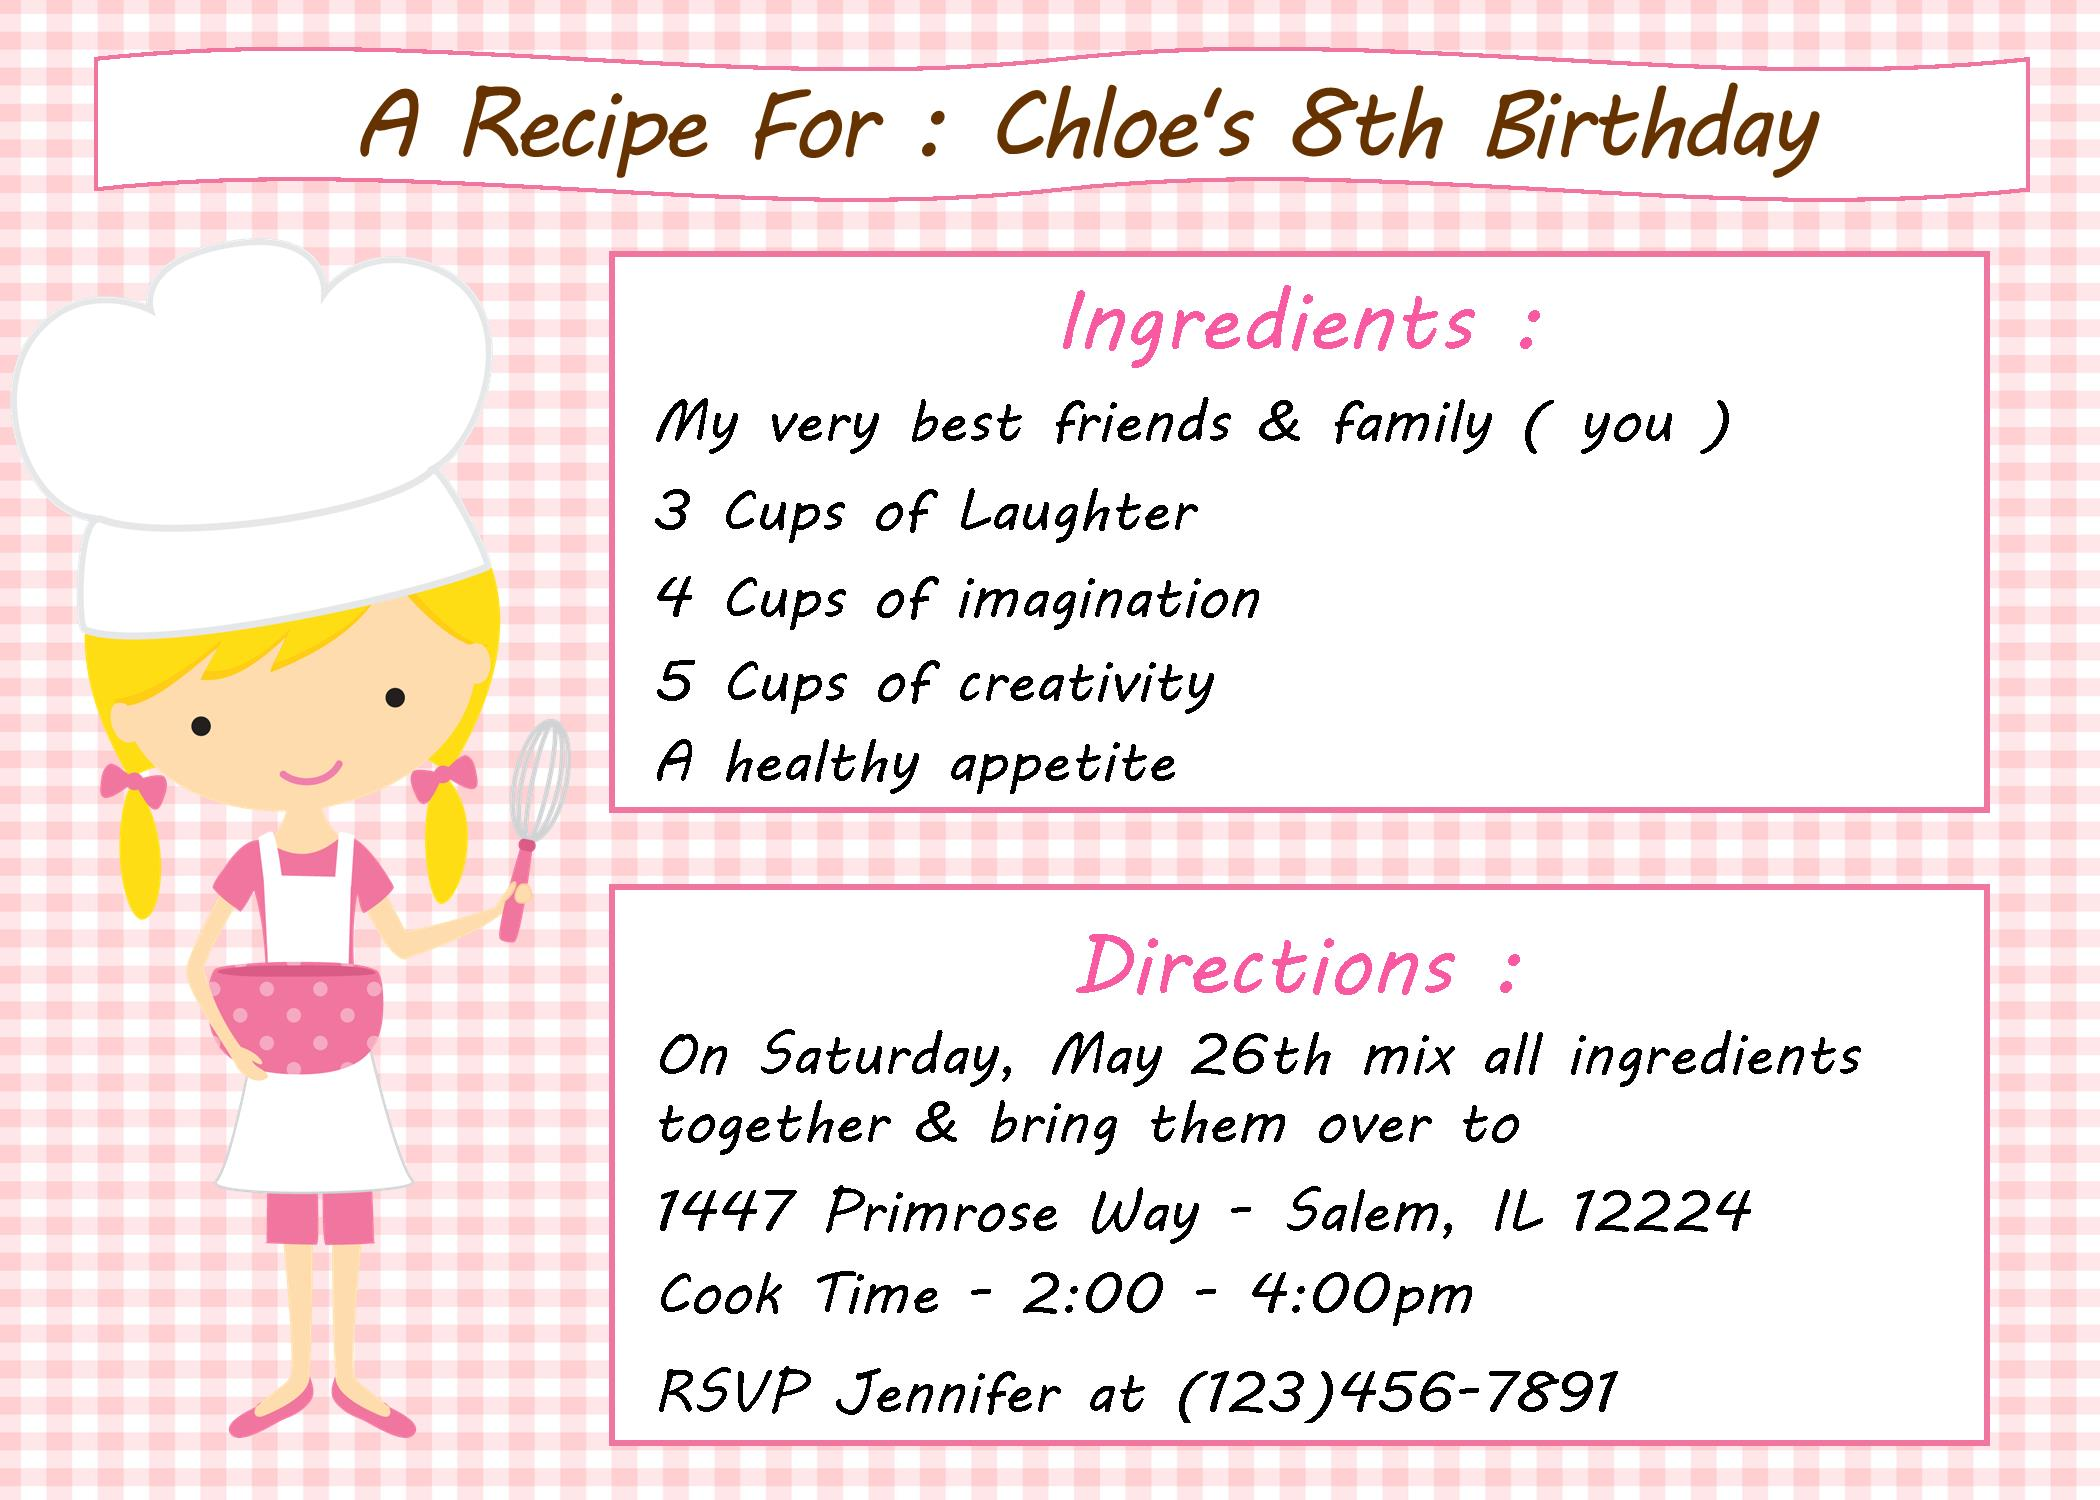 Kids CookingBaking Birthday Party Invitation – Cooking Birthday Party Invitations